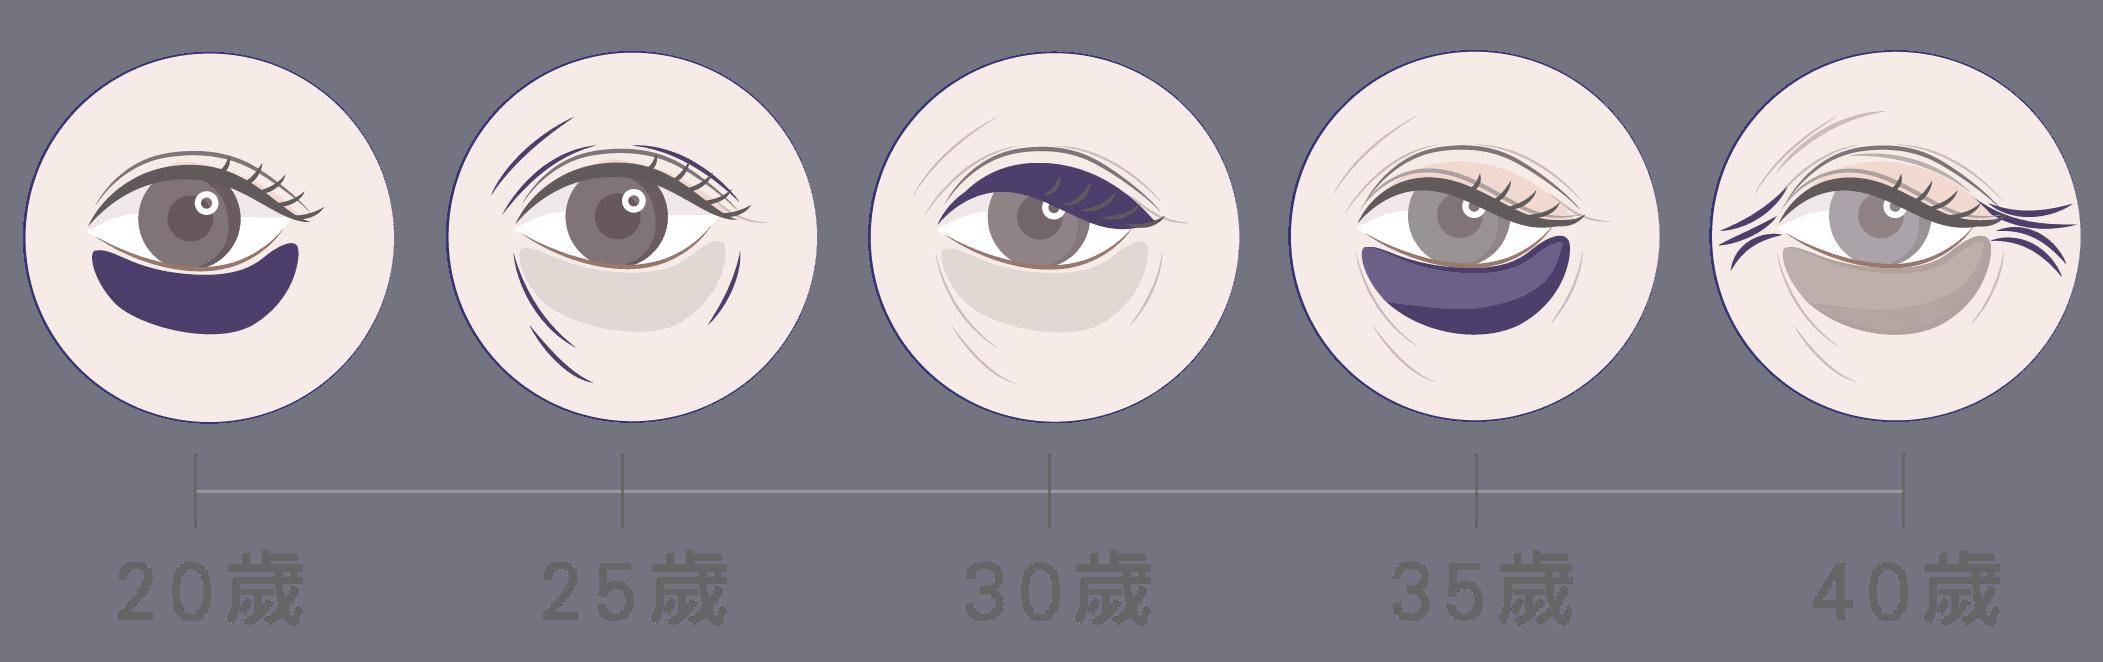 eyes02 17 1